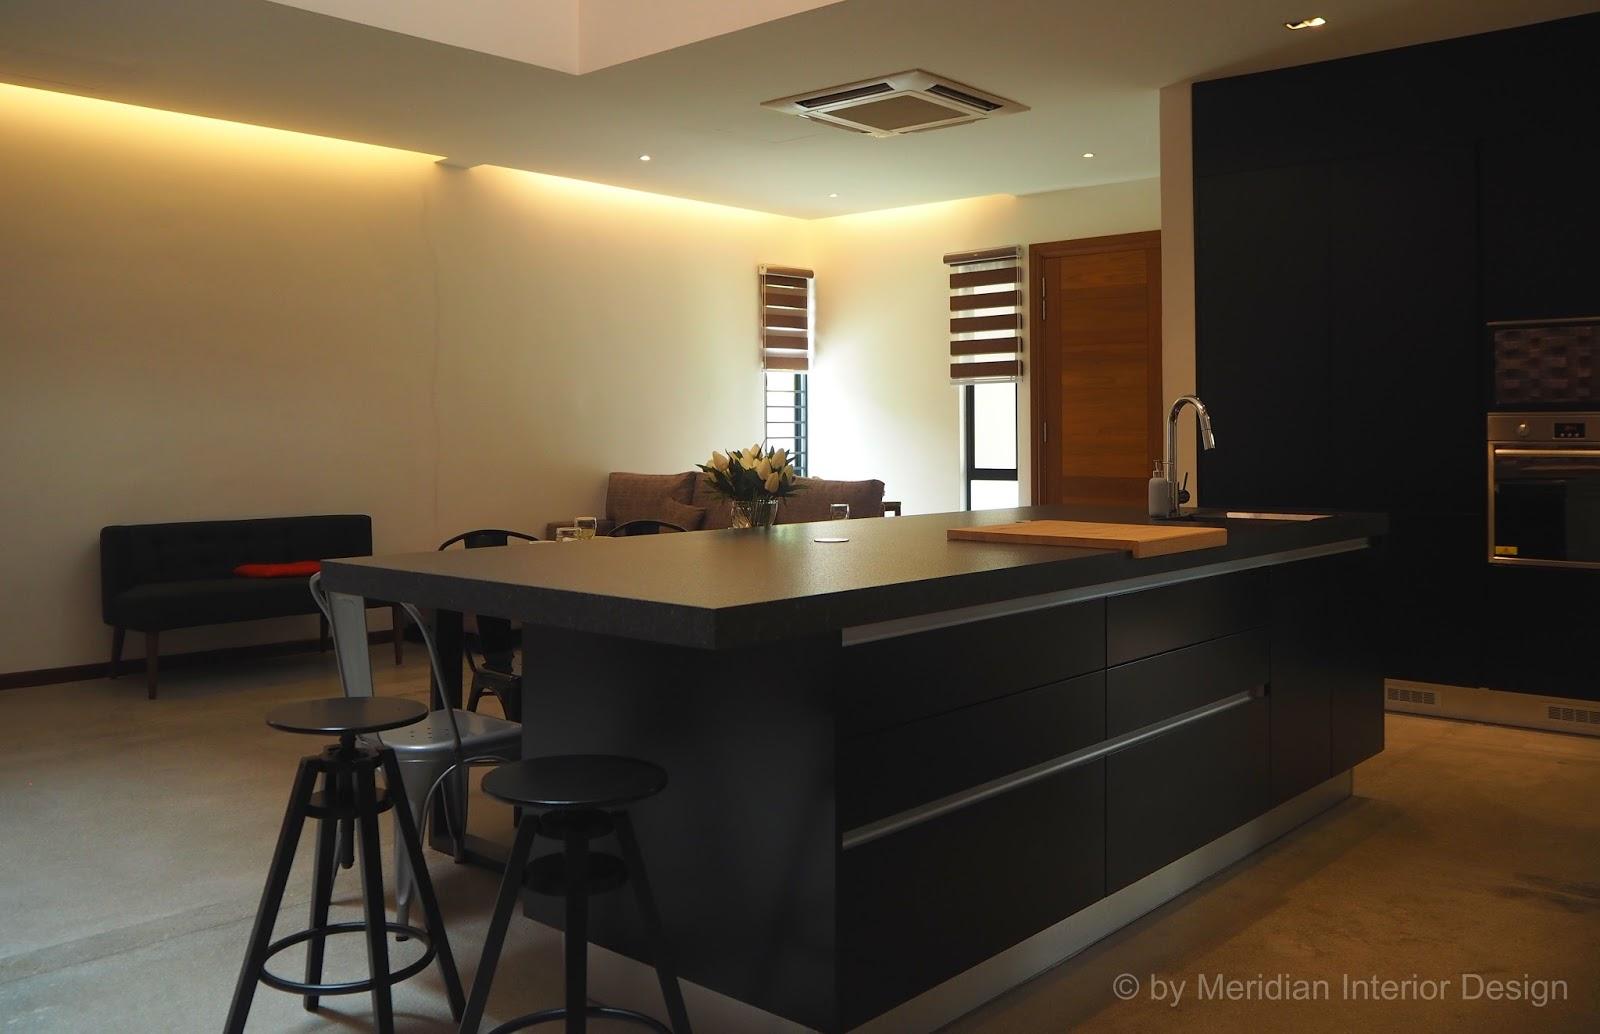 Meridian Interior Design And Kitchen Design In Kuala Lumpur Selangor Malaysia Industrial